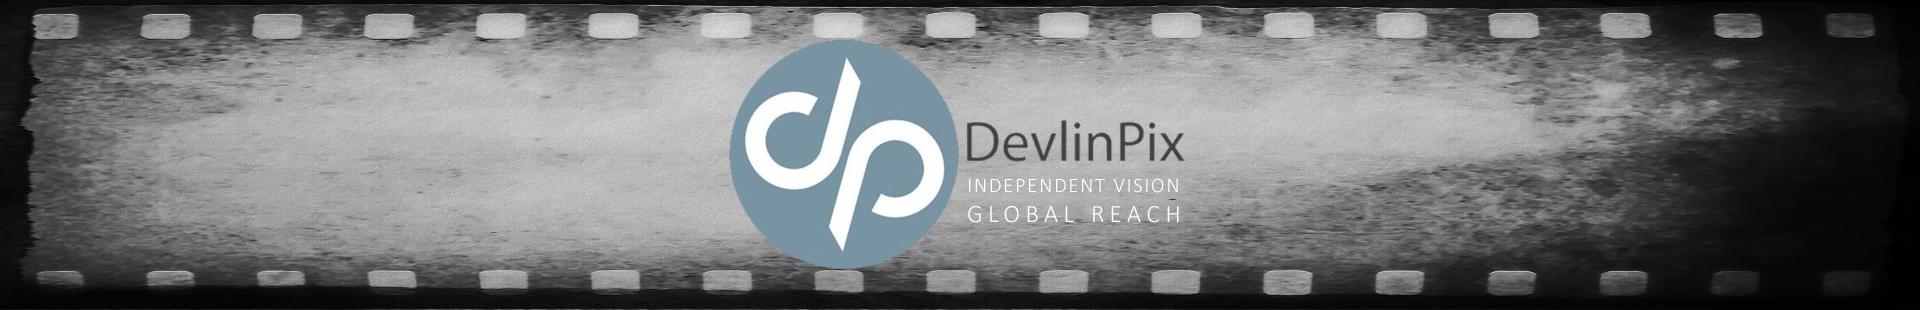 Devlin Pix